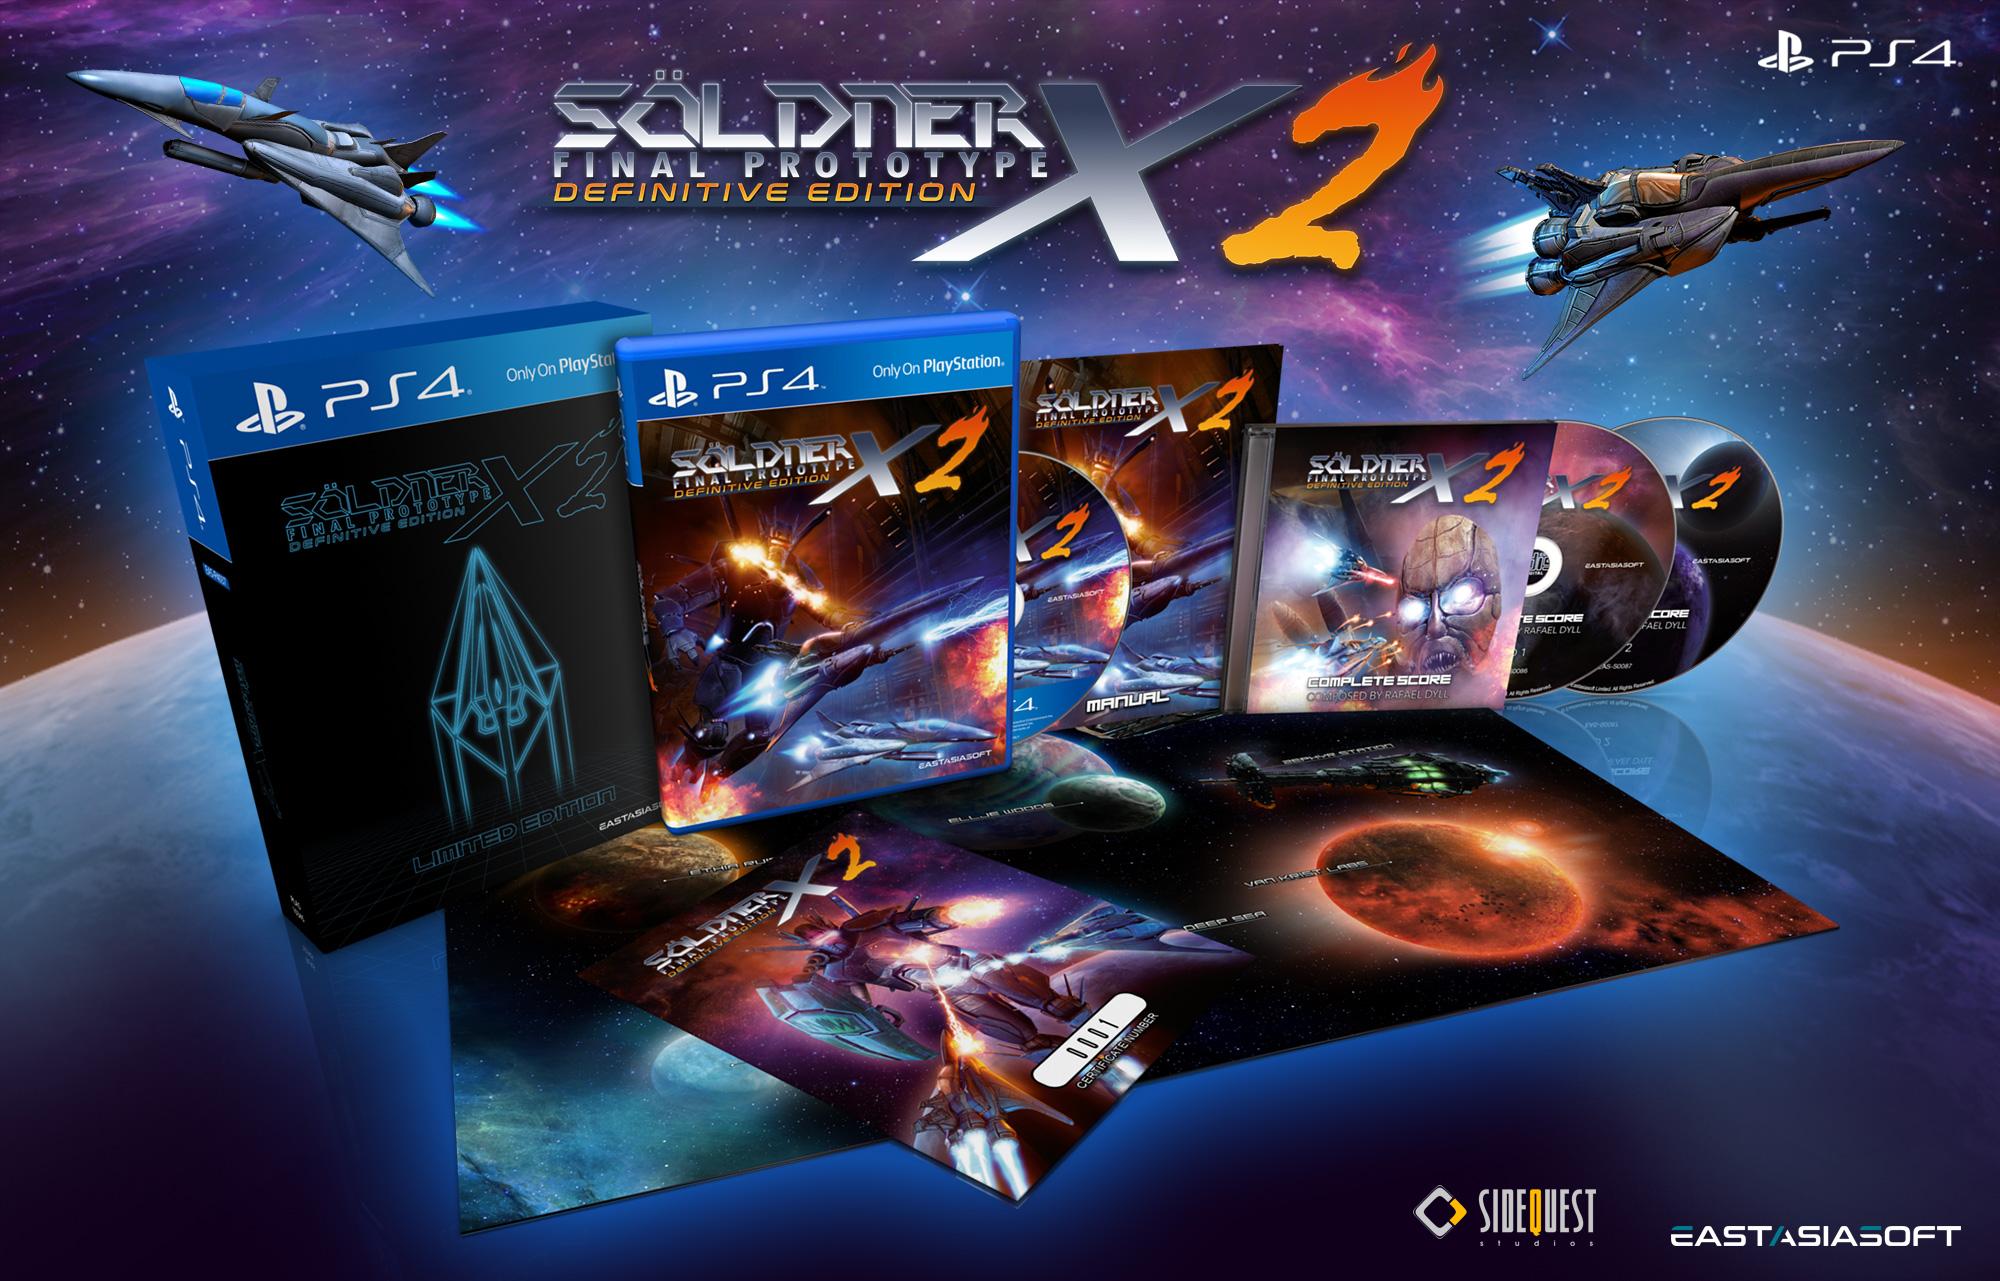 Soldner-X 2 Final Prototype Definitive E